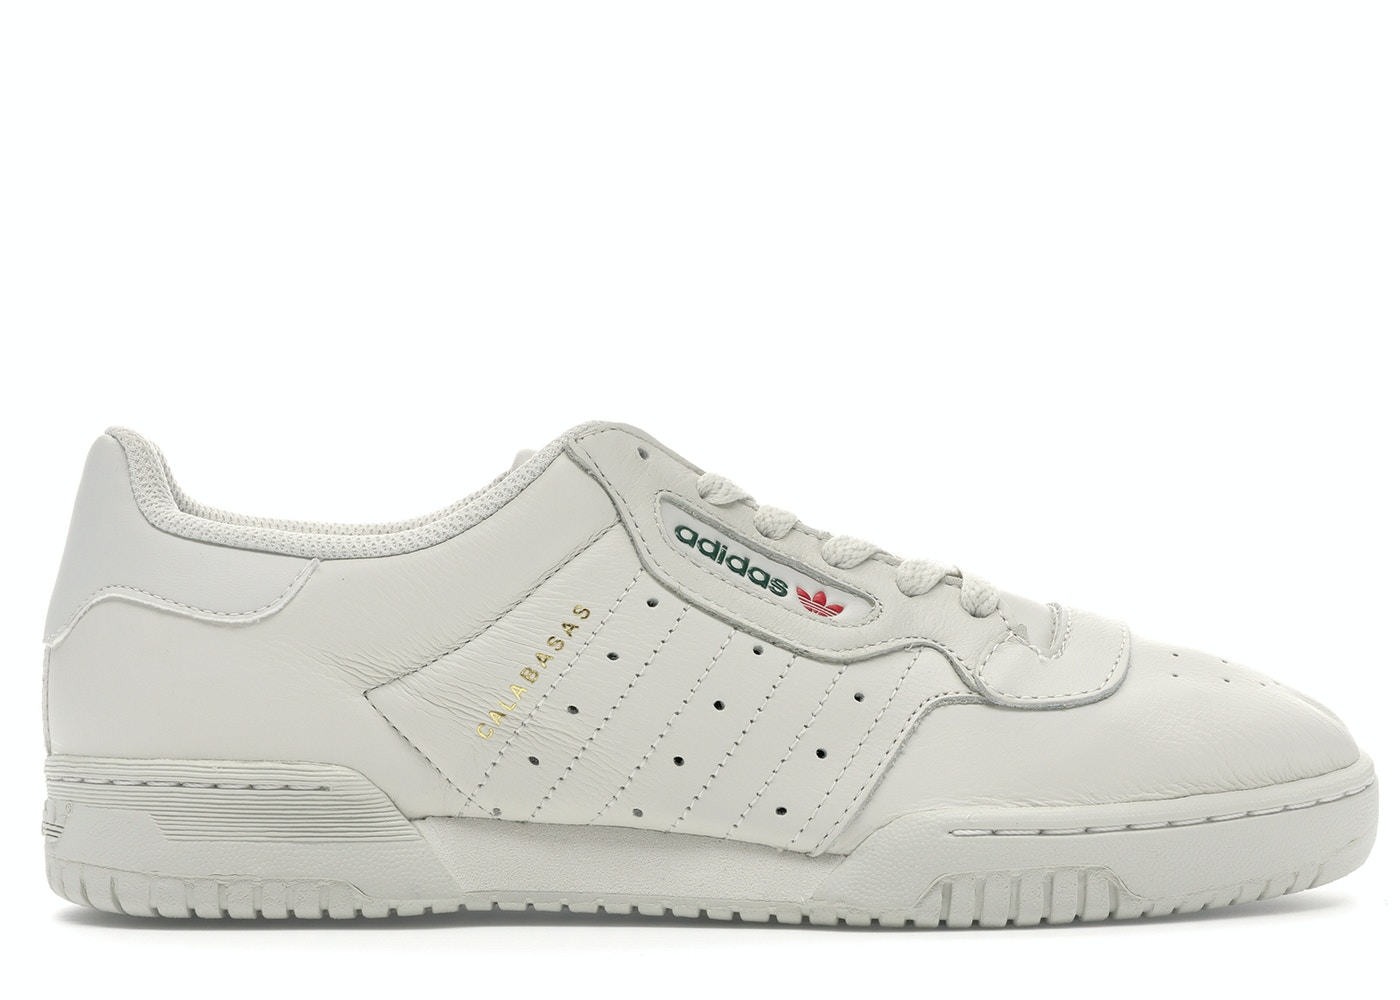 0c3c53c6c86ba Sneakers Size 7 - Total Sold